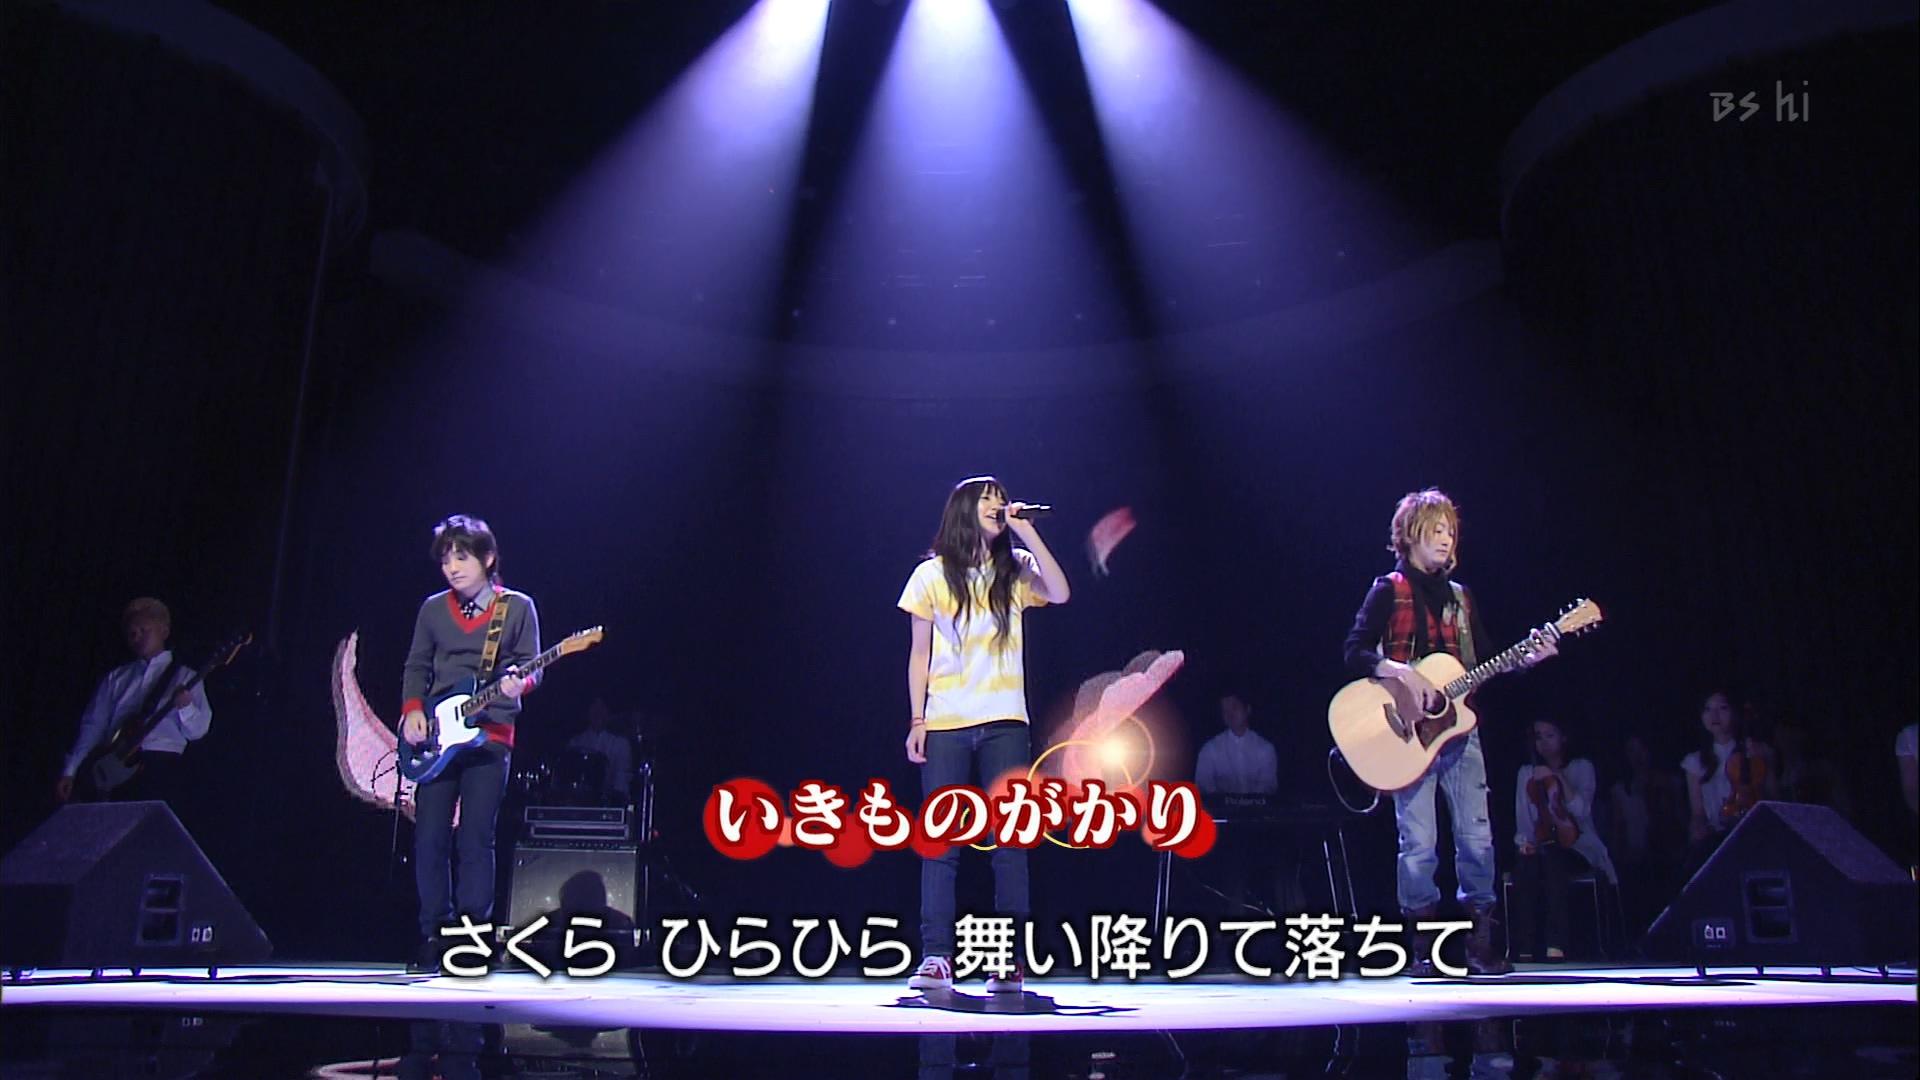 16-01-01-03